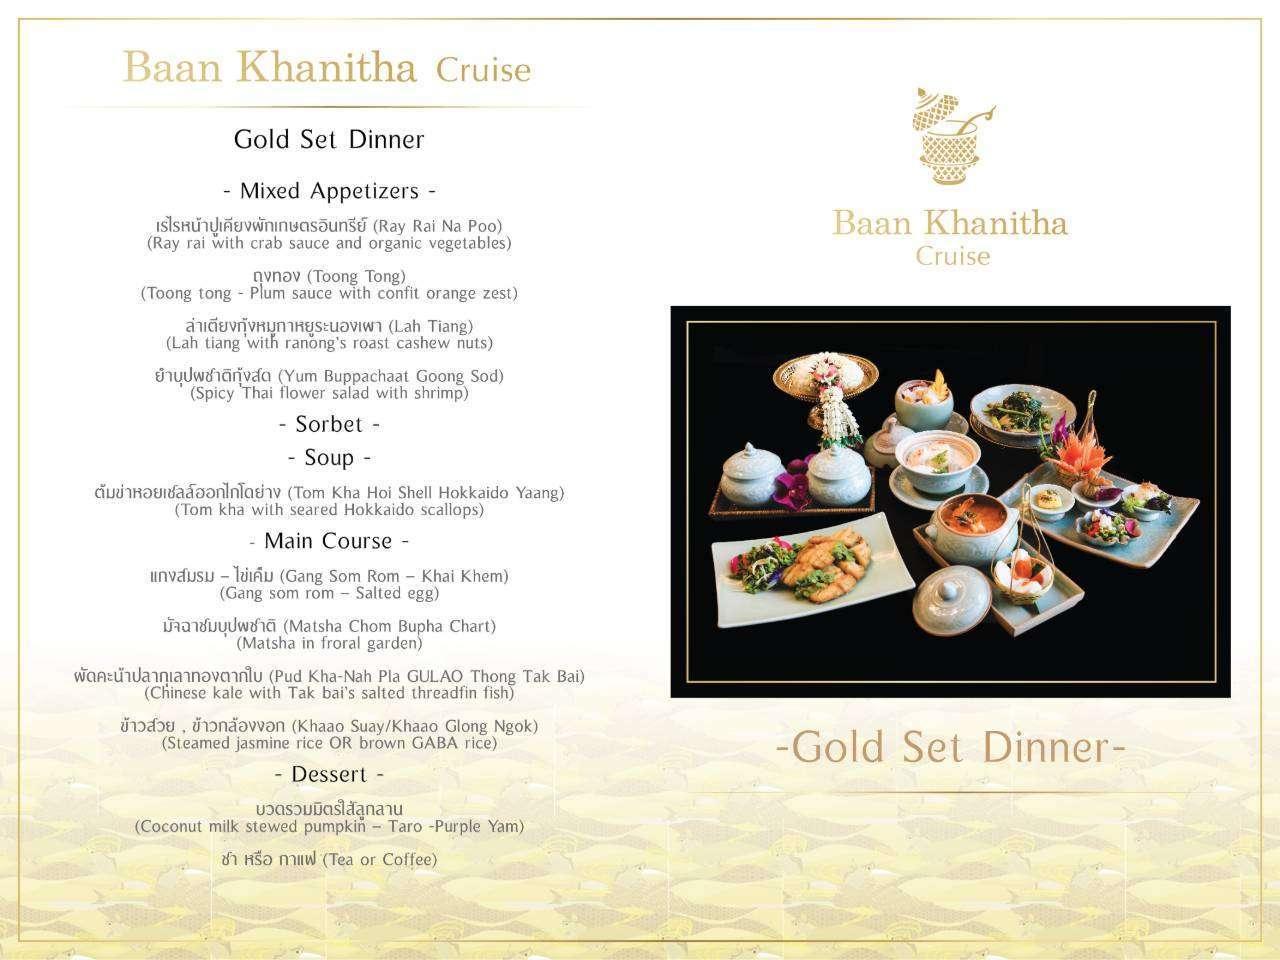 Menu of the Gold Set Dinner during the Job Khanitha Cruise